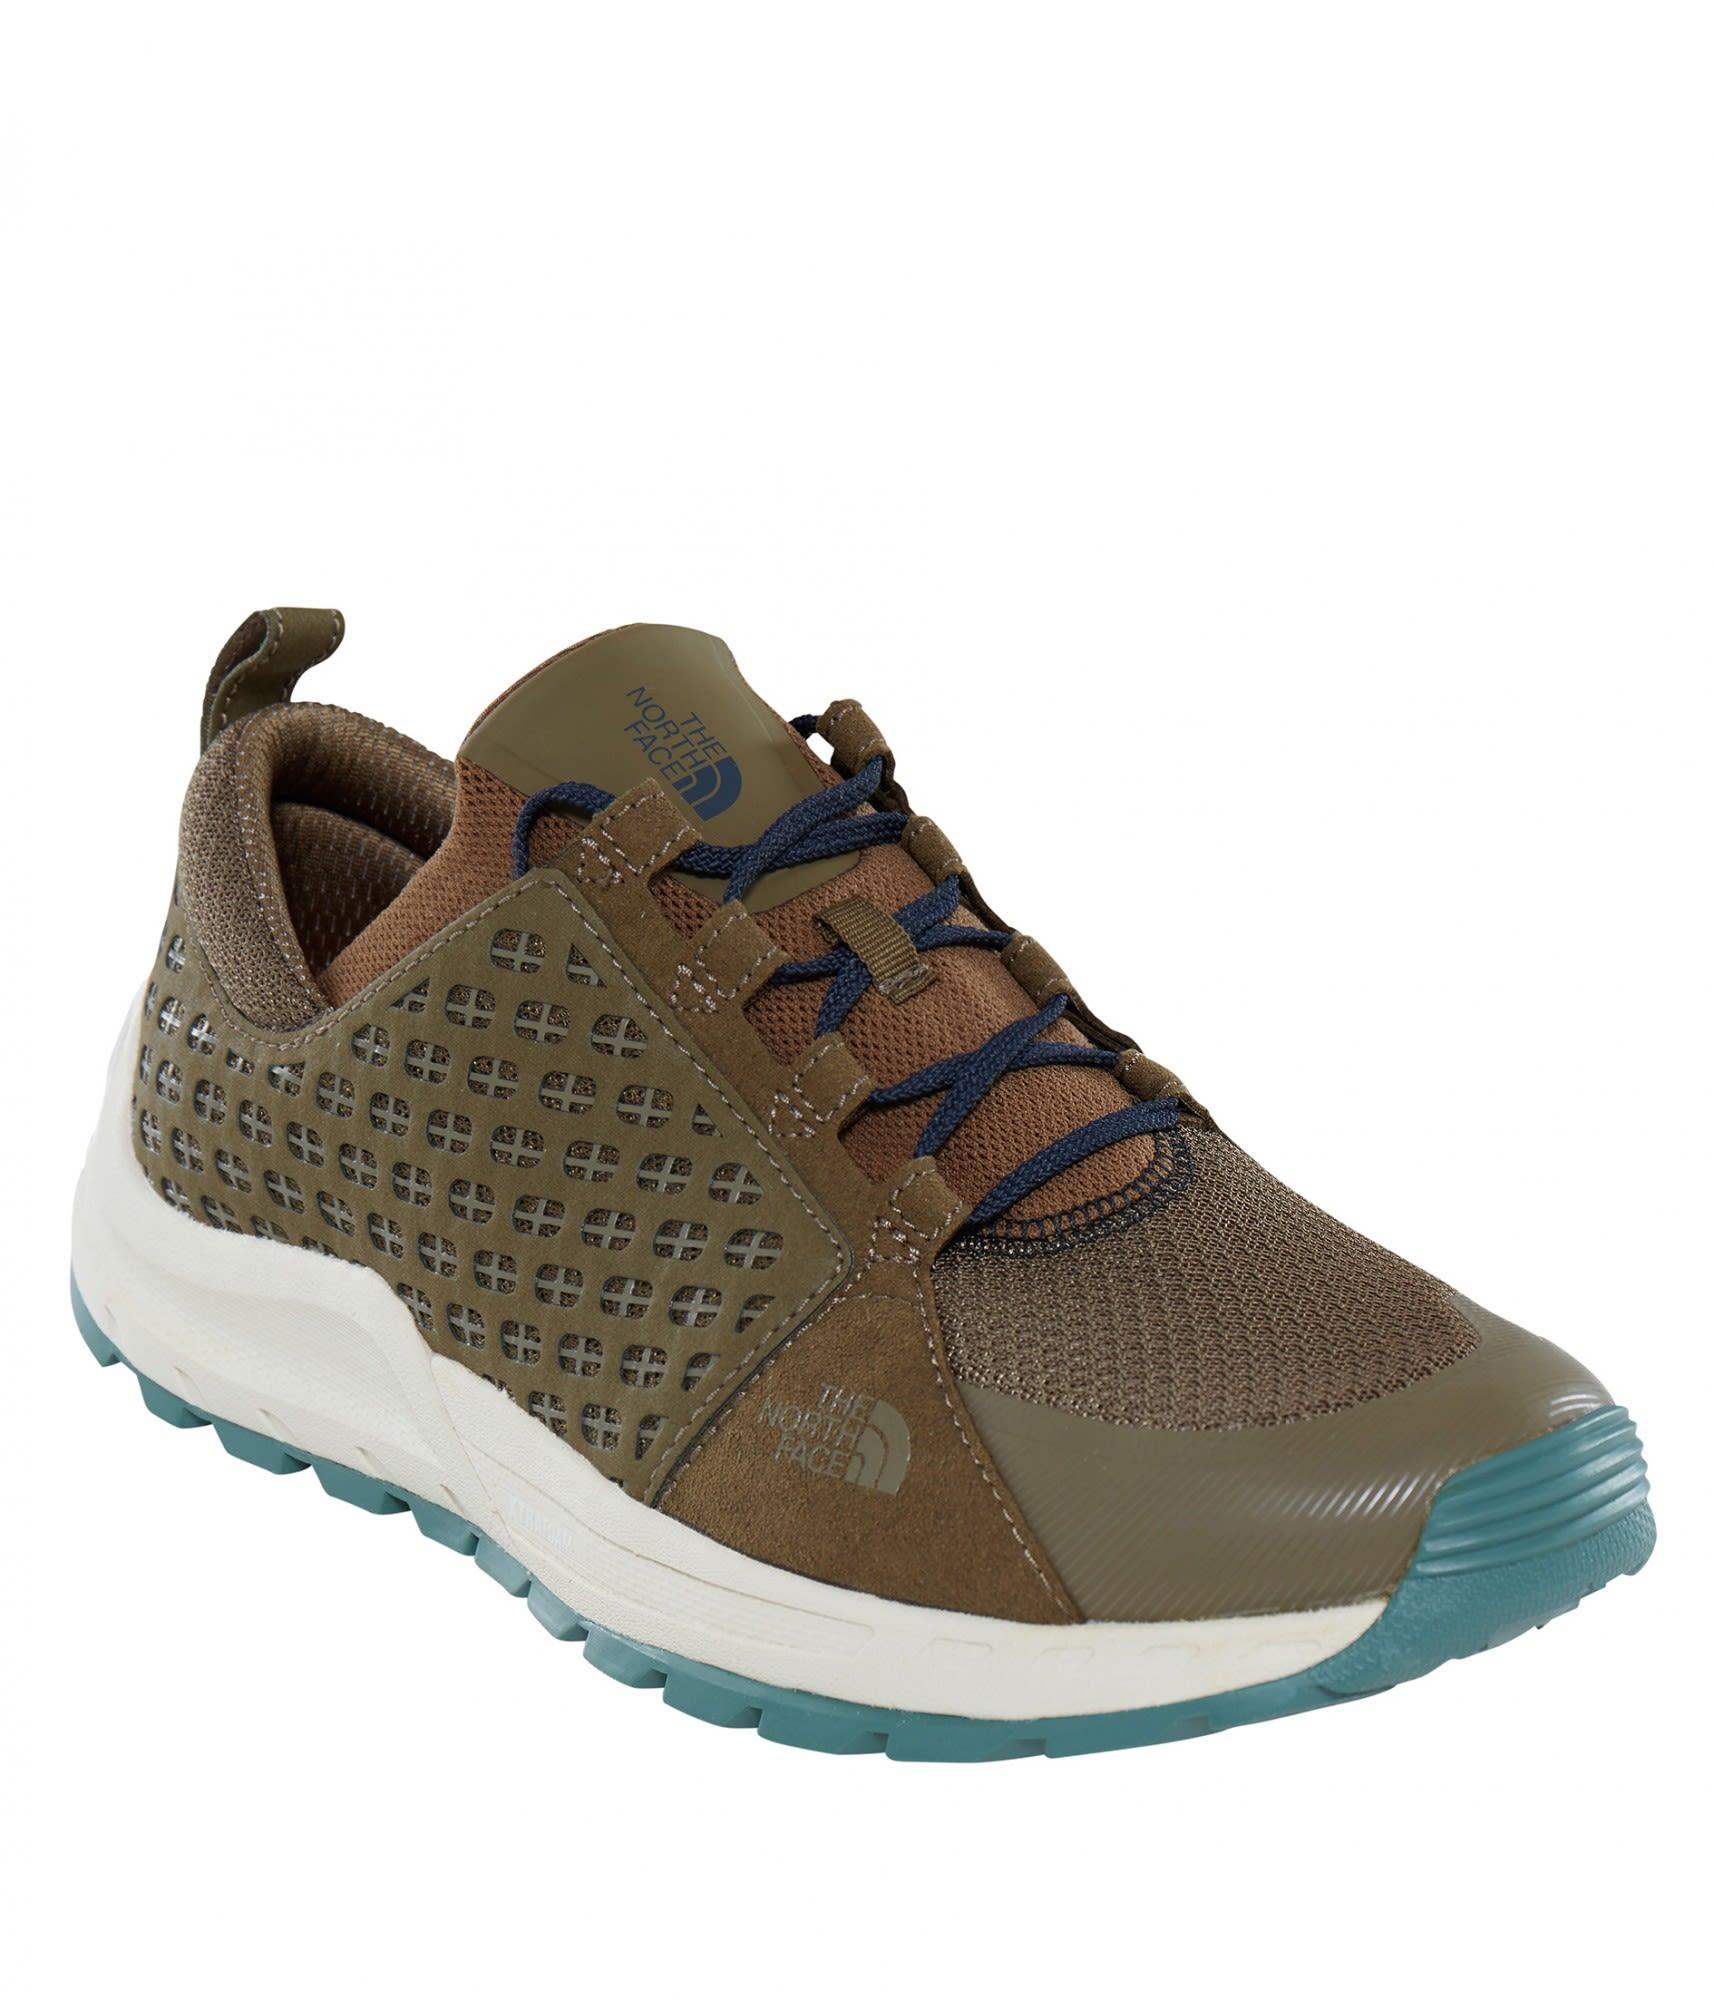 The North Face M Mountain Sneaker   Größe EU 41 / US 8.5 / UK 7.5,EU 42 / US 9